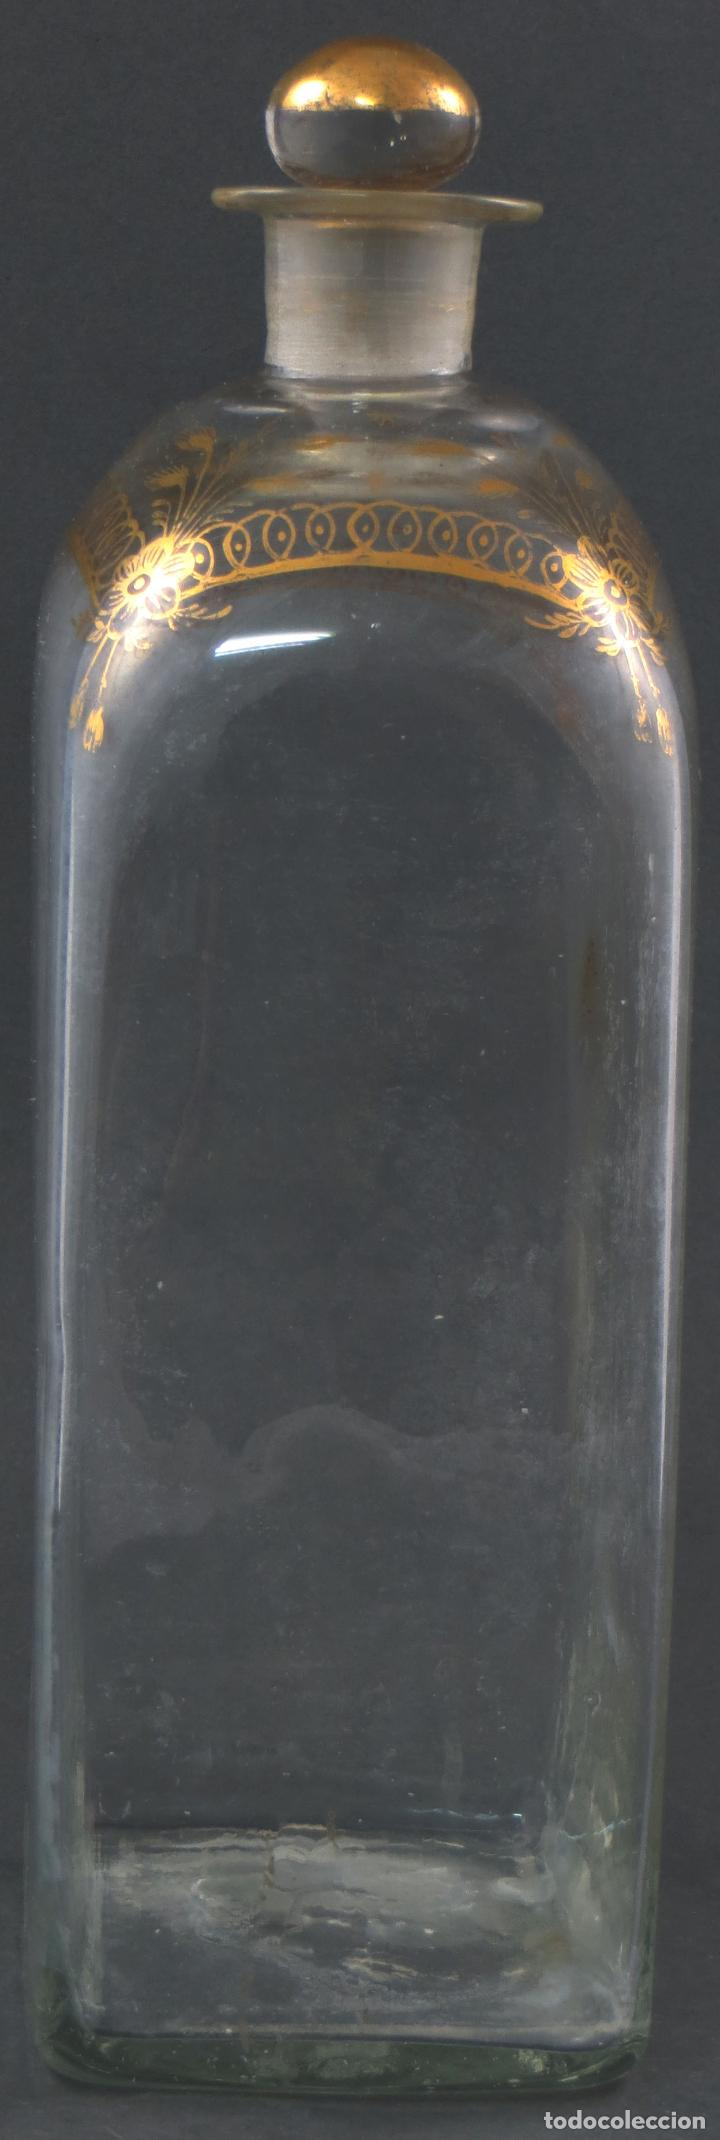 Antigüedades: Botella garrafa licorera cristal soplado y pintada en oro La Granja siglo XIX - Foto 2 - 113073243